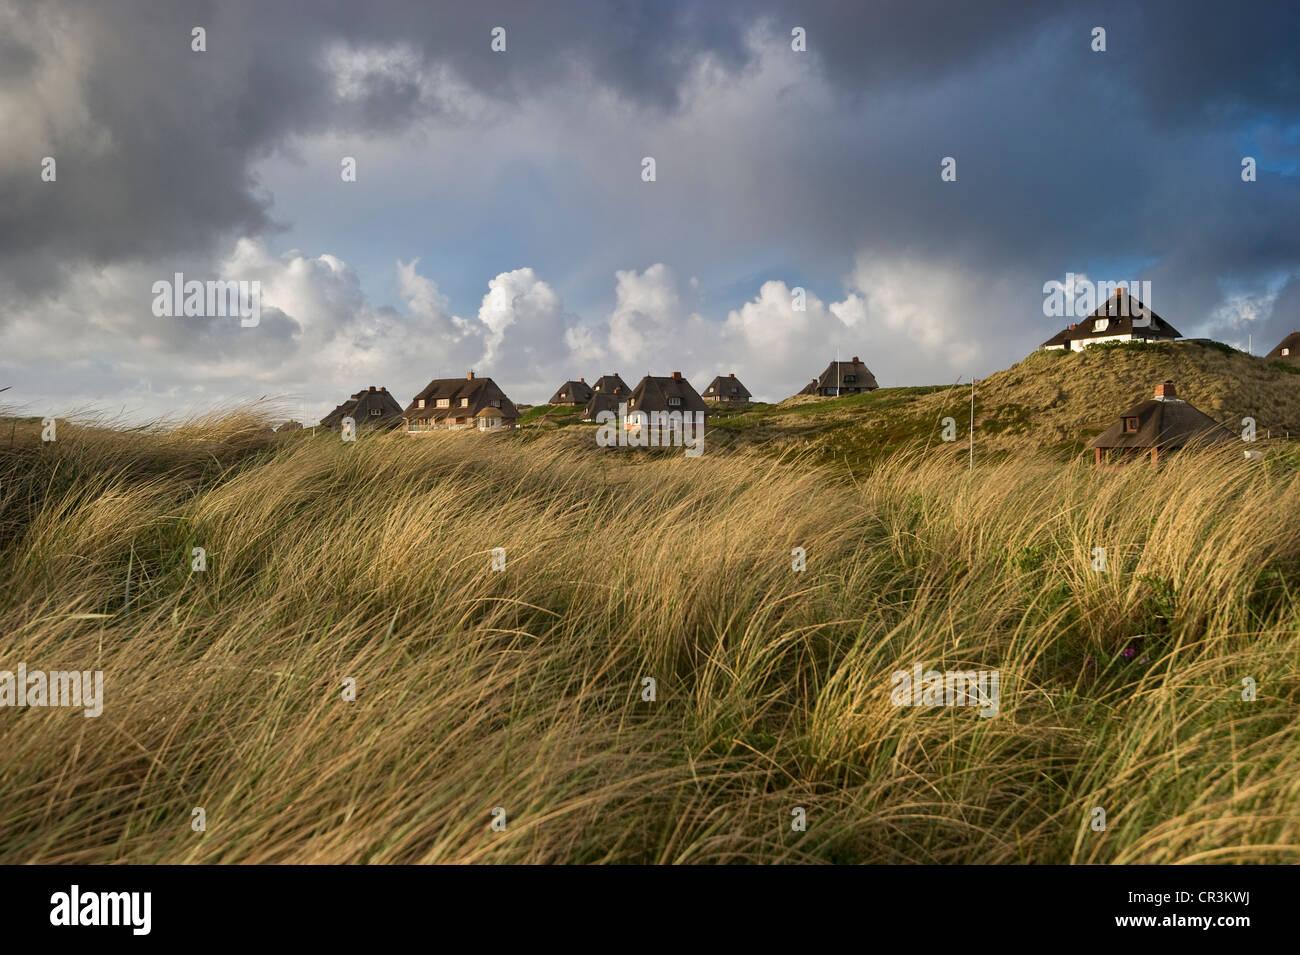 Hoernum, Sylt island, Schleswig-Holstein, Germany, Europe - Stock Image